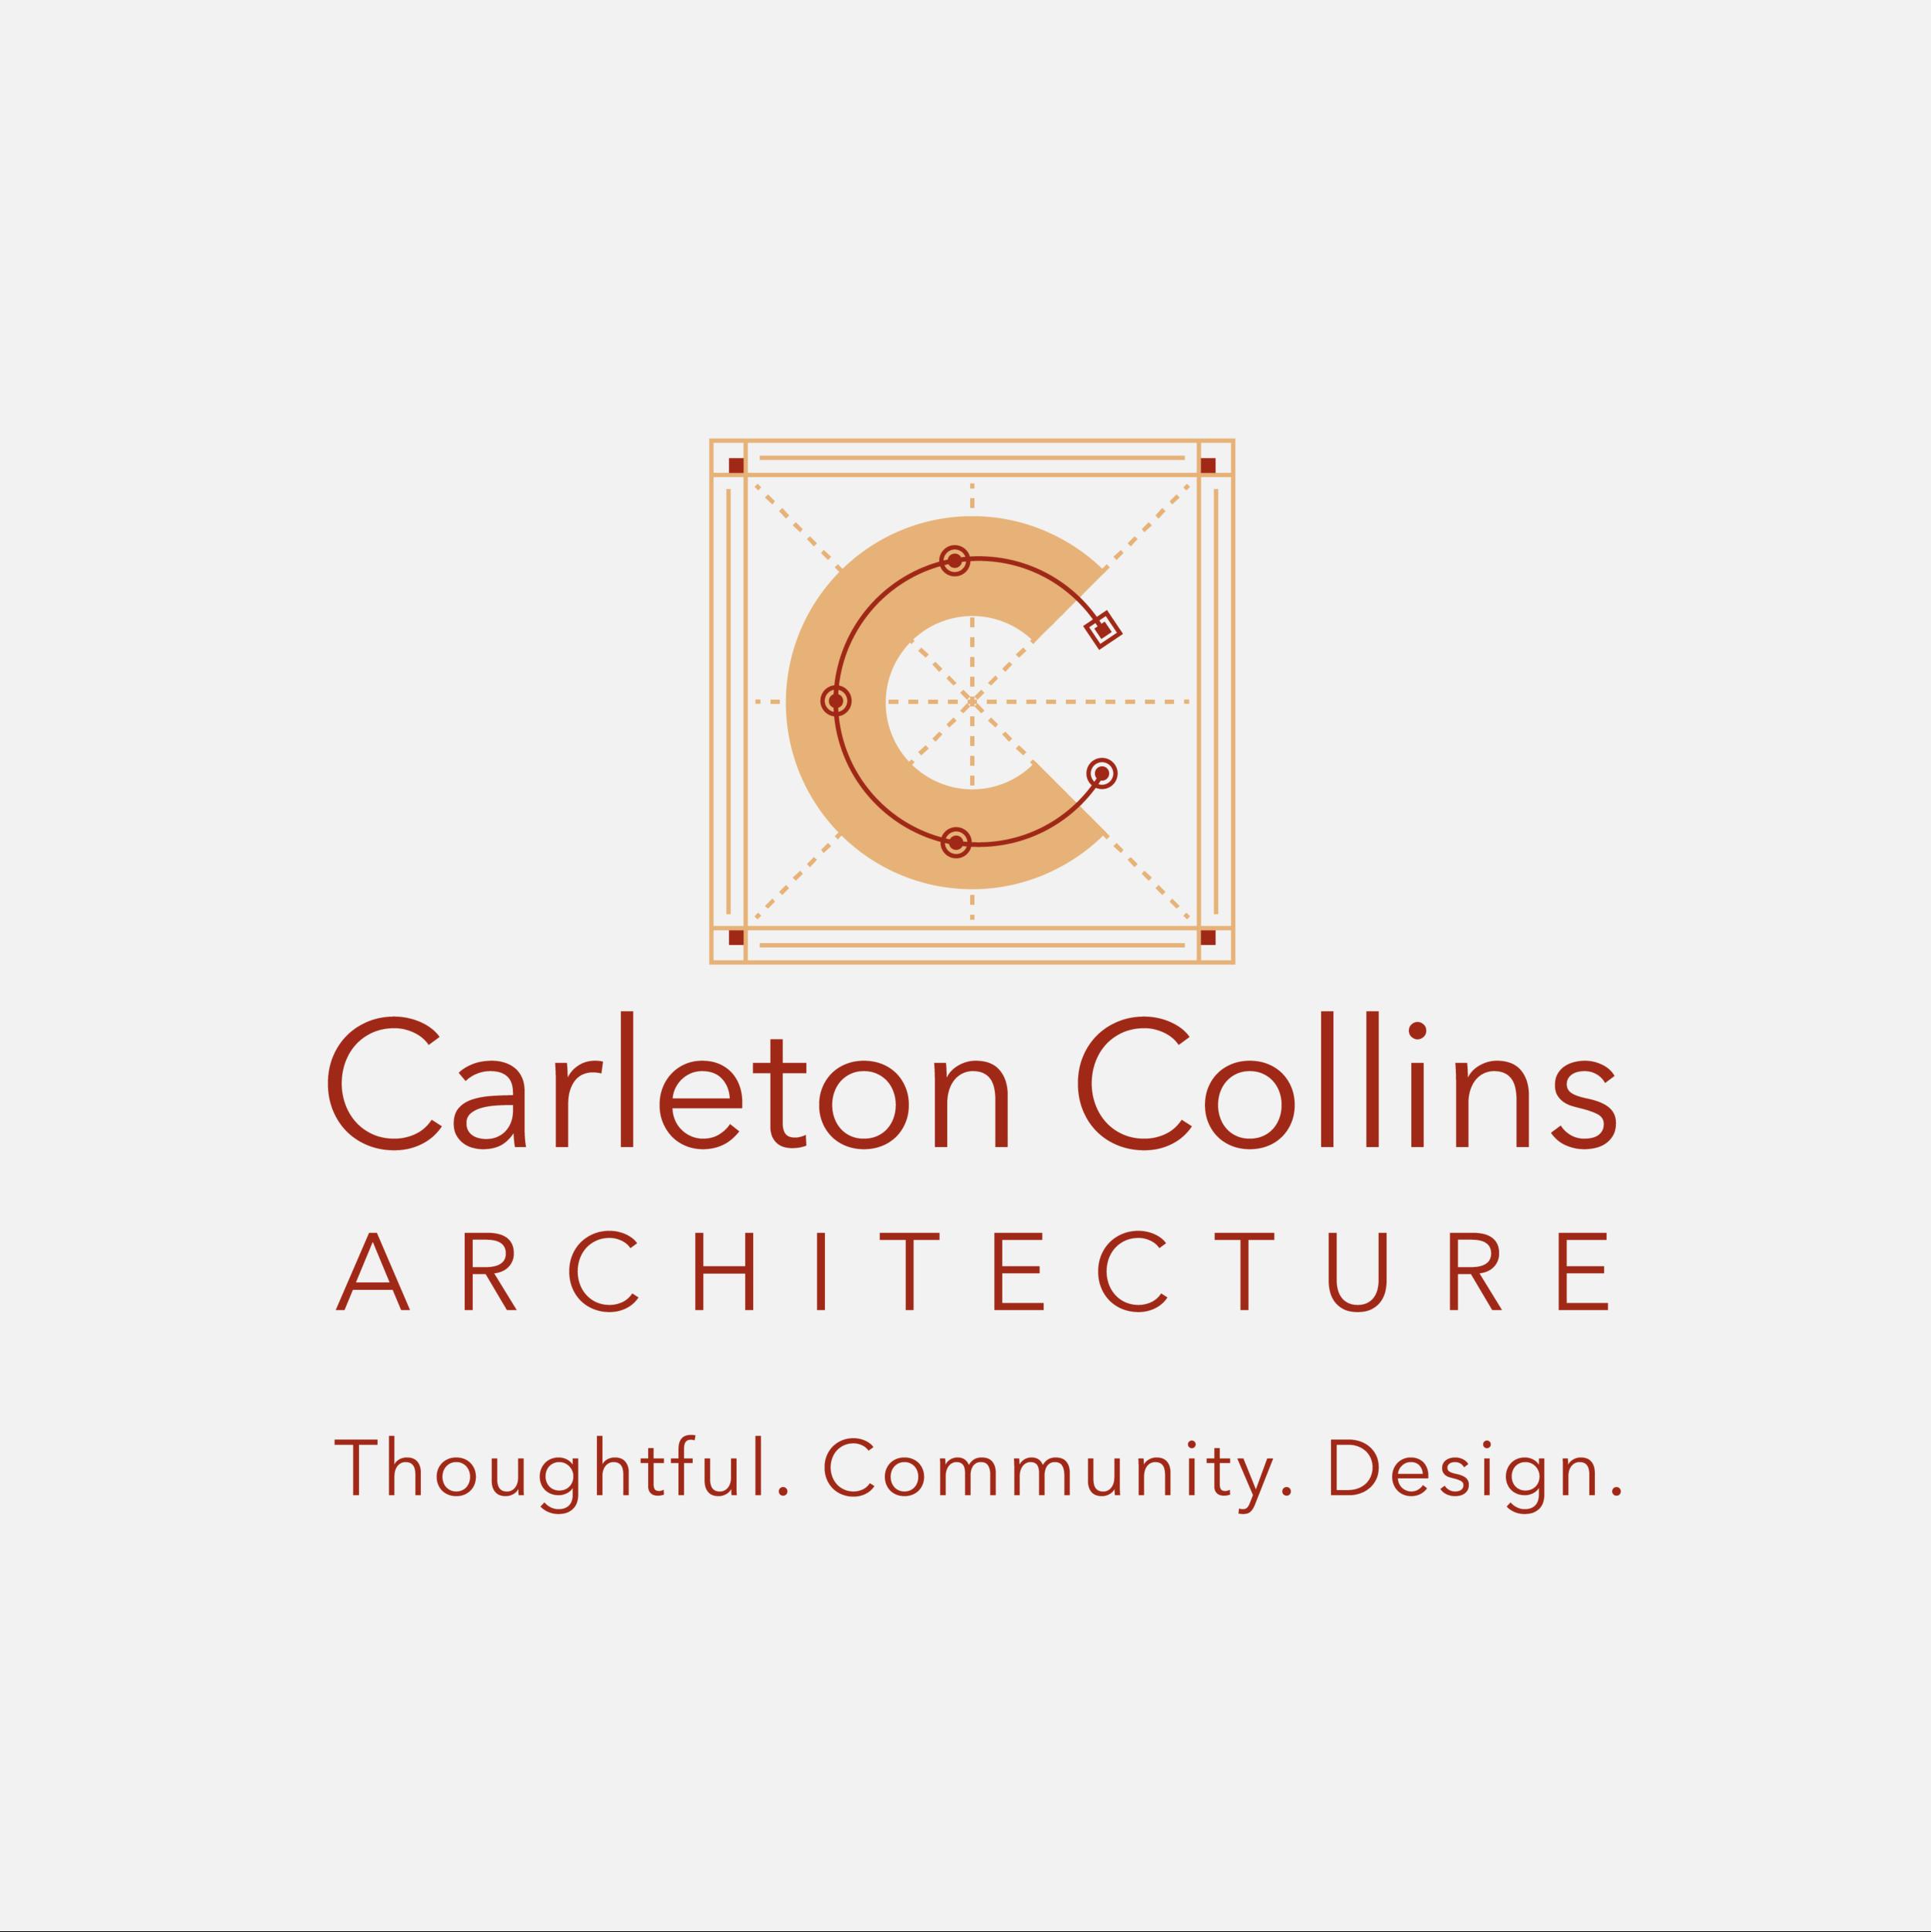 CC_Logo-01.png